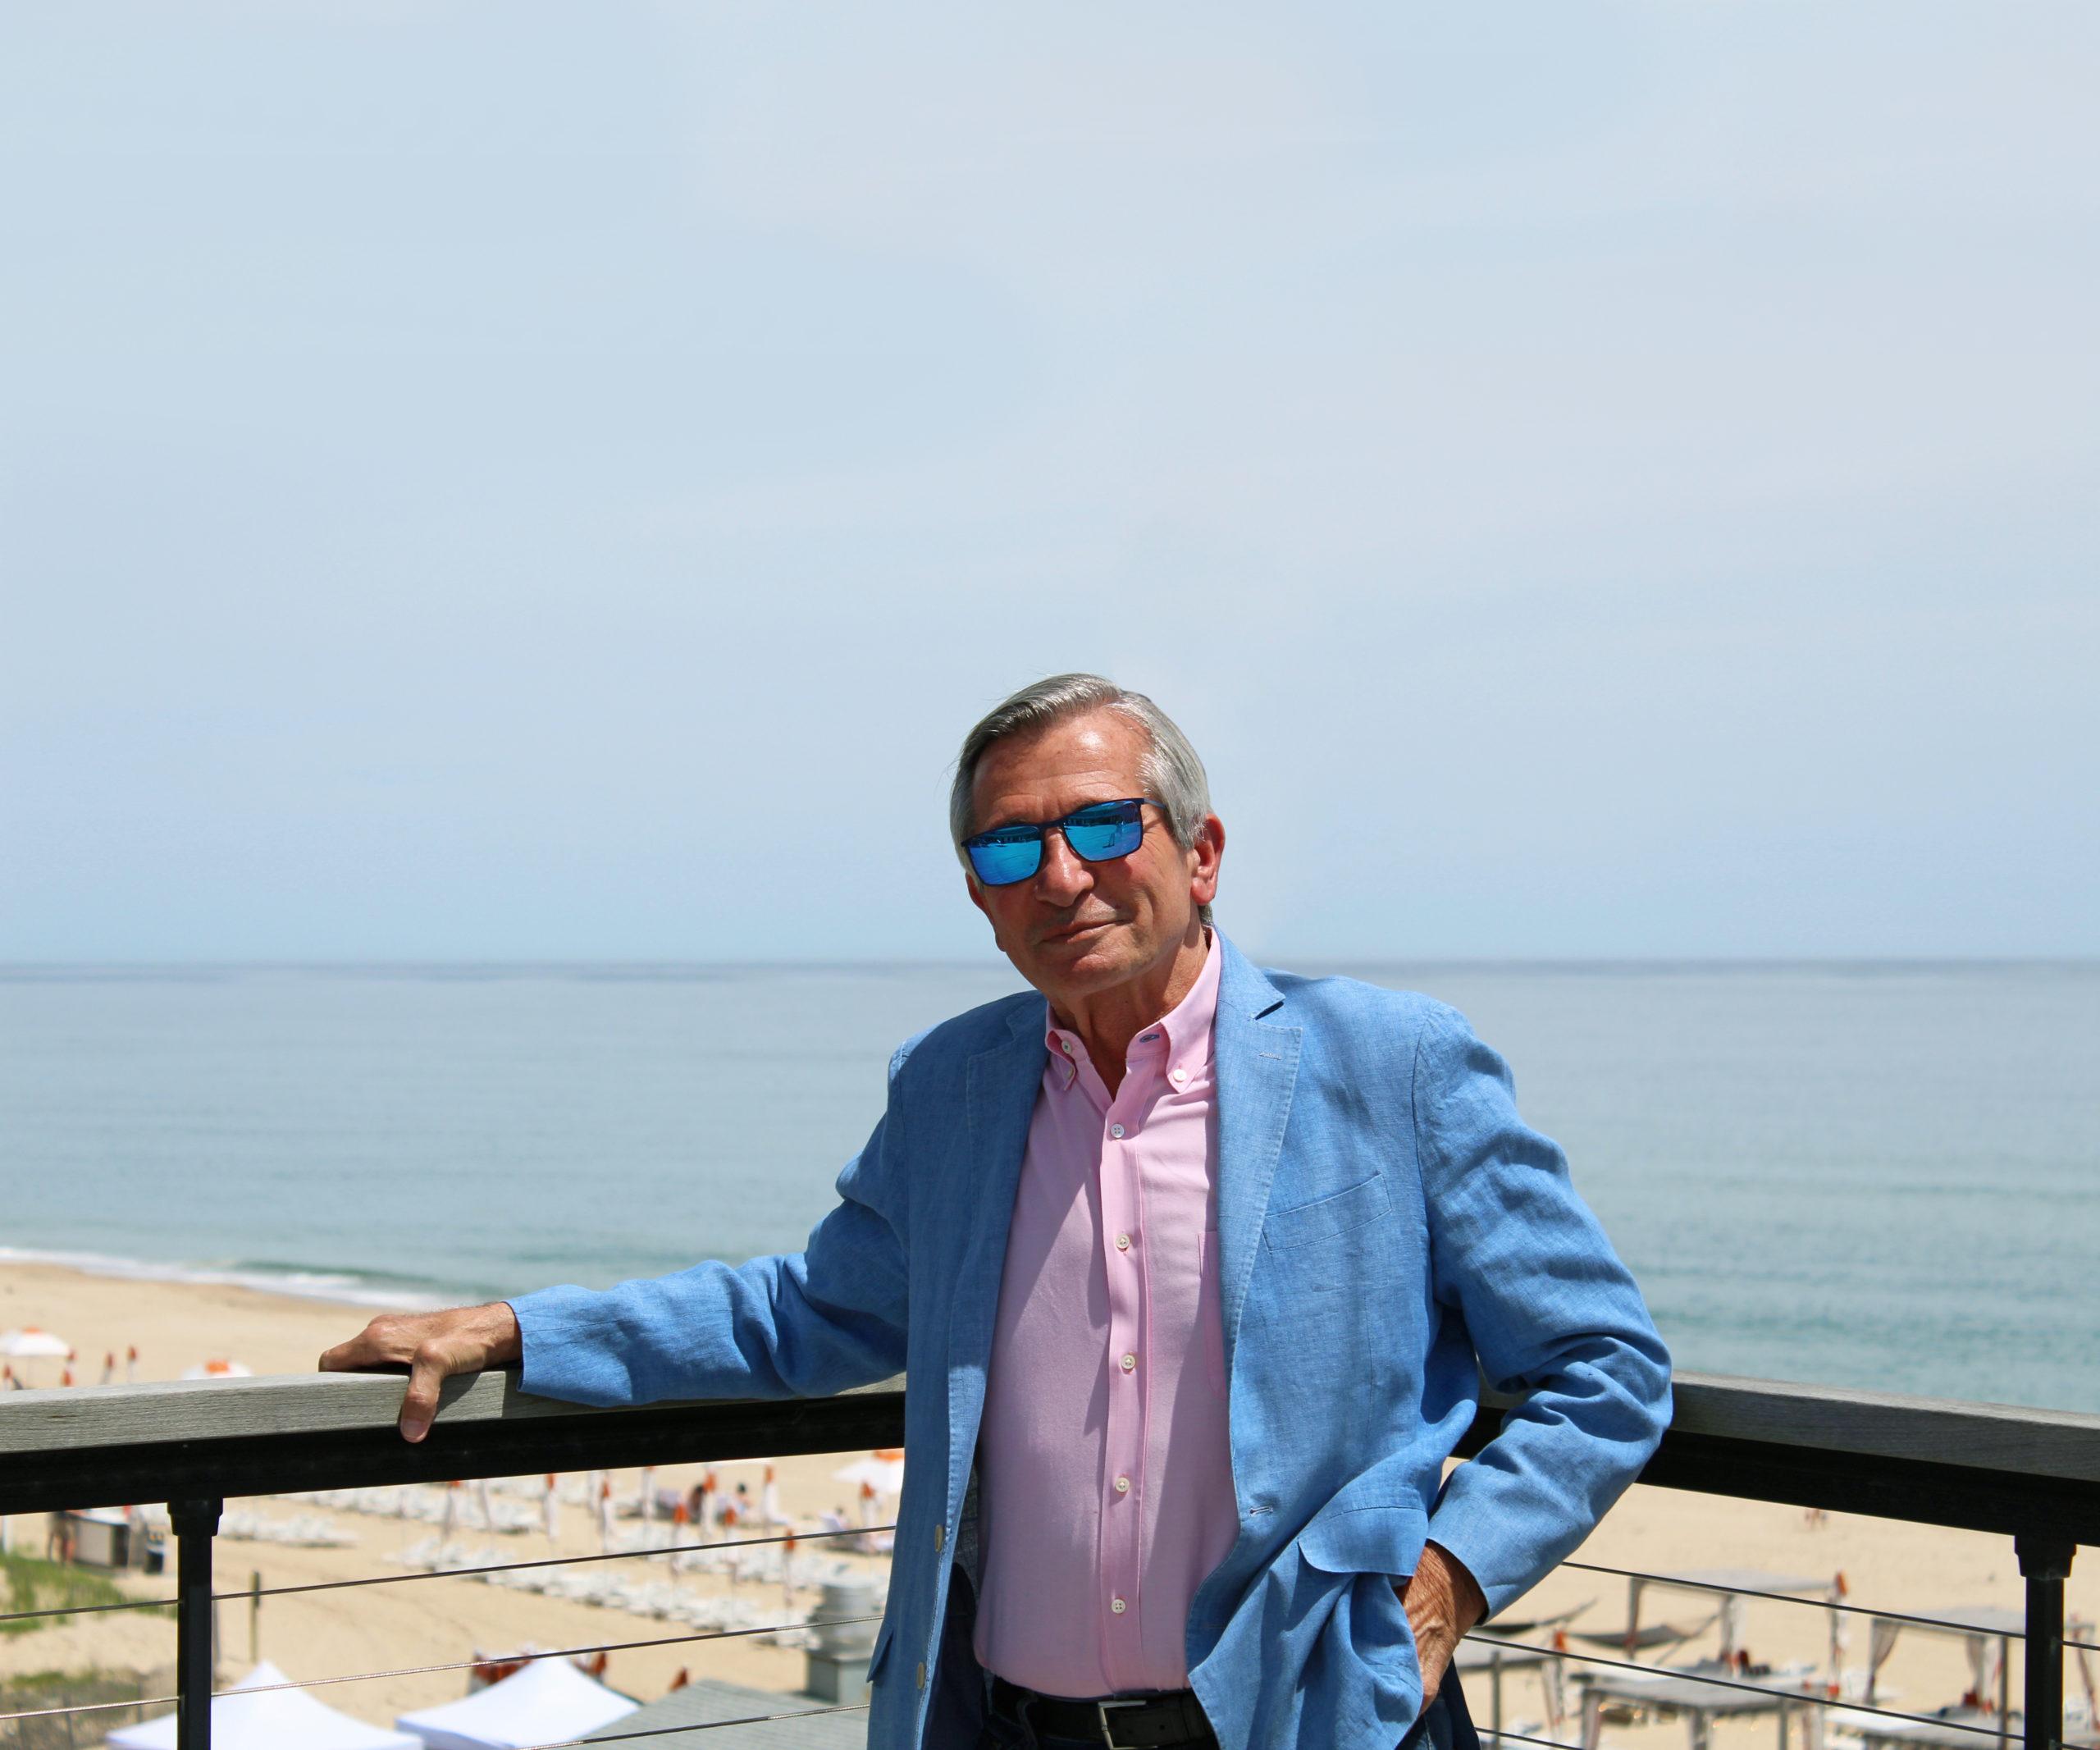 Enzo Morabito, associate real estate broker with Douglas Elliman